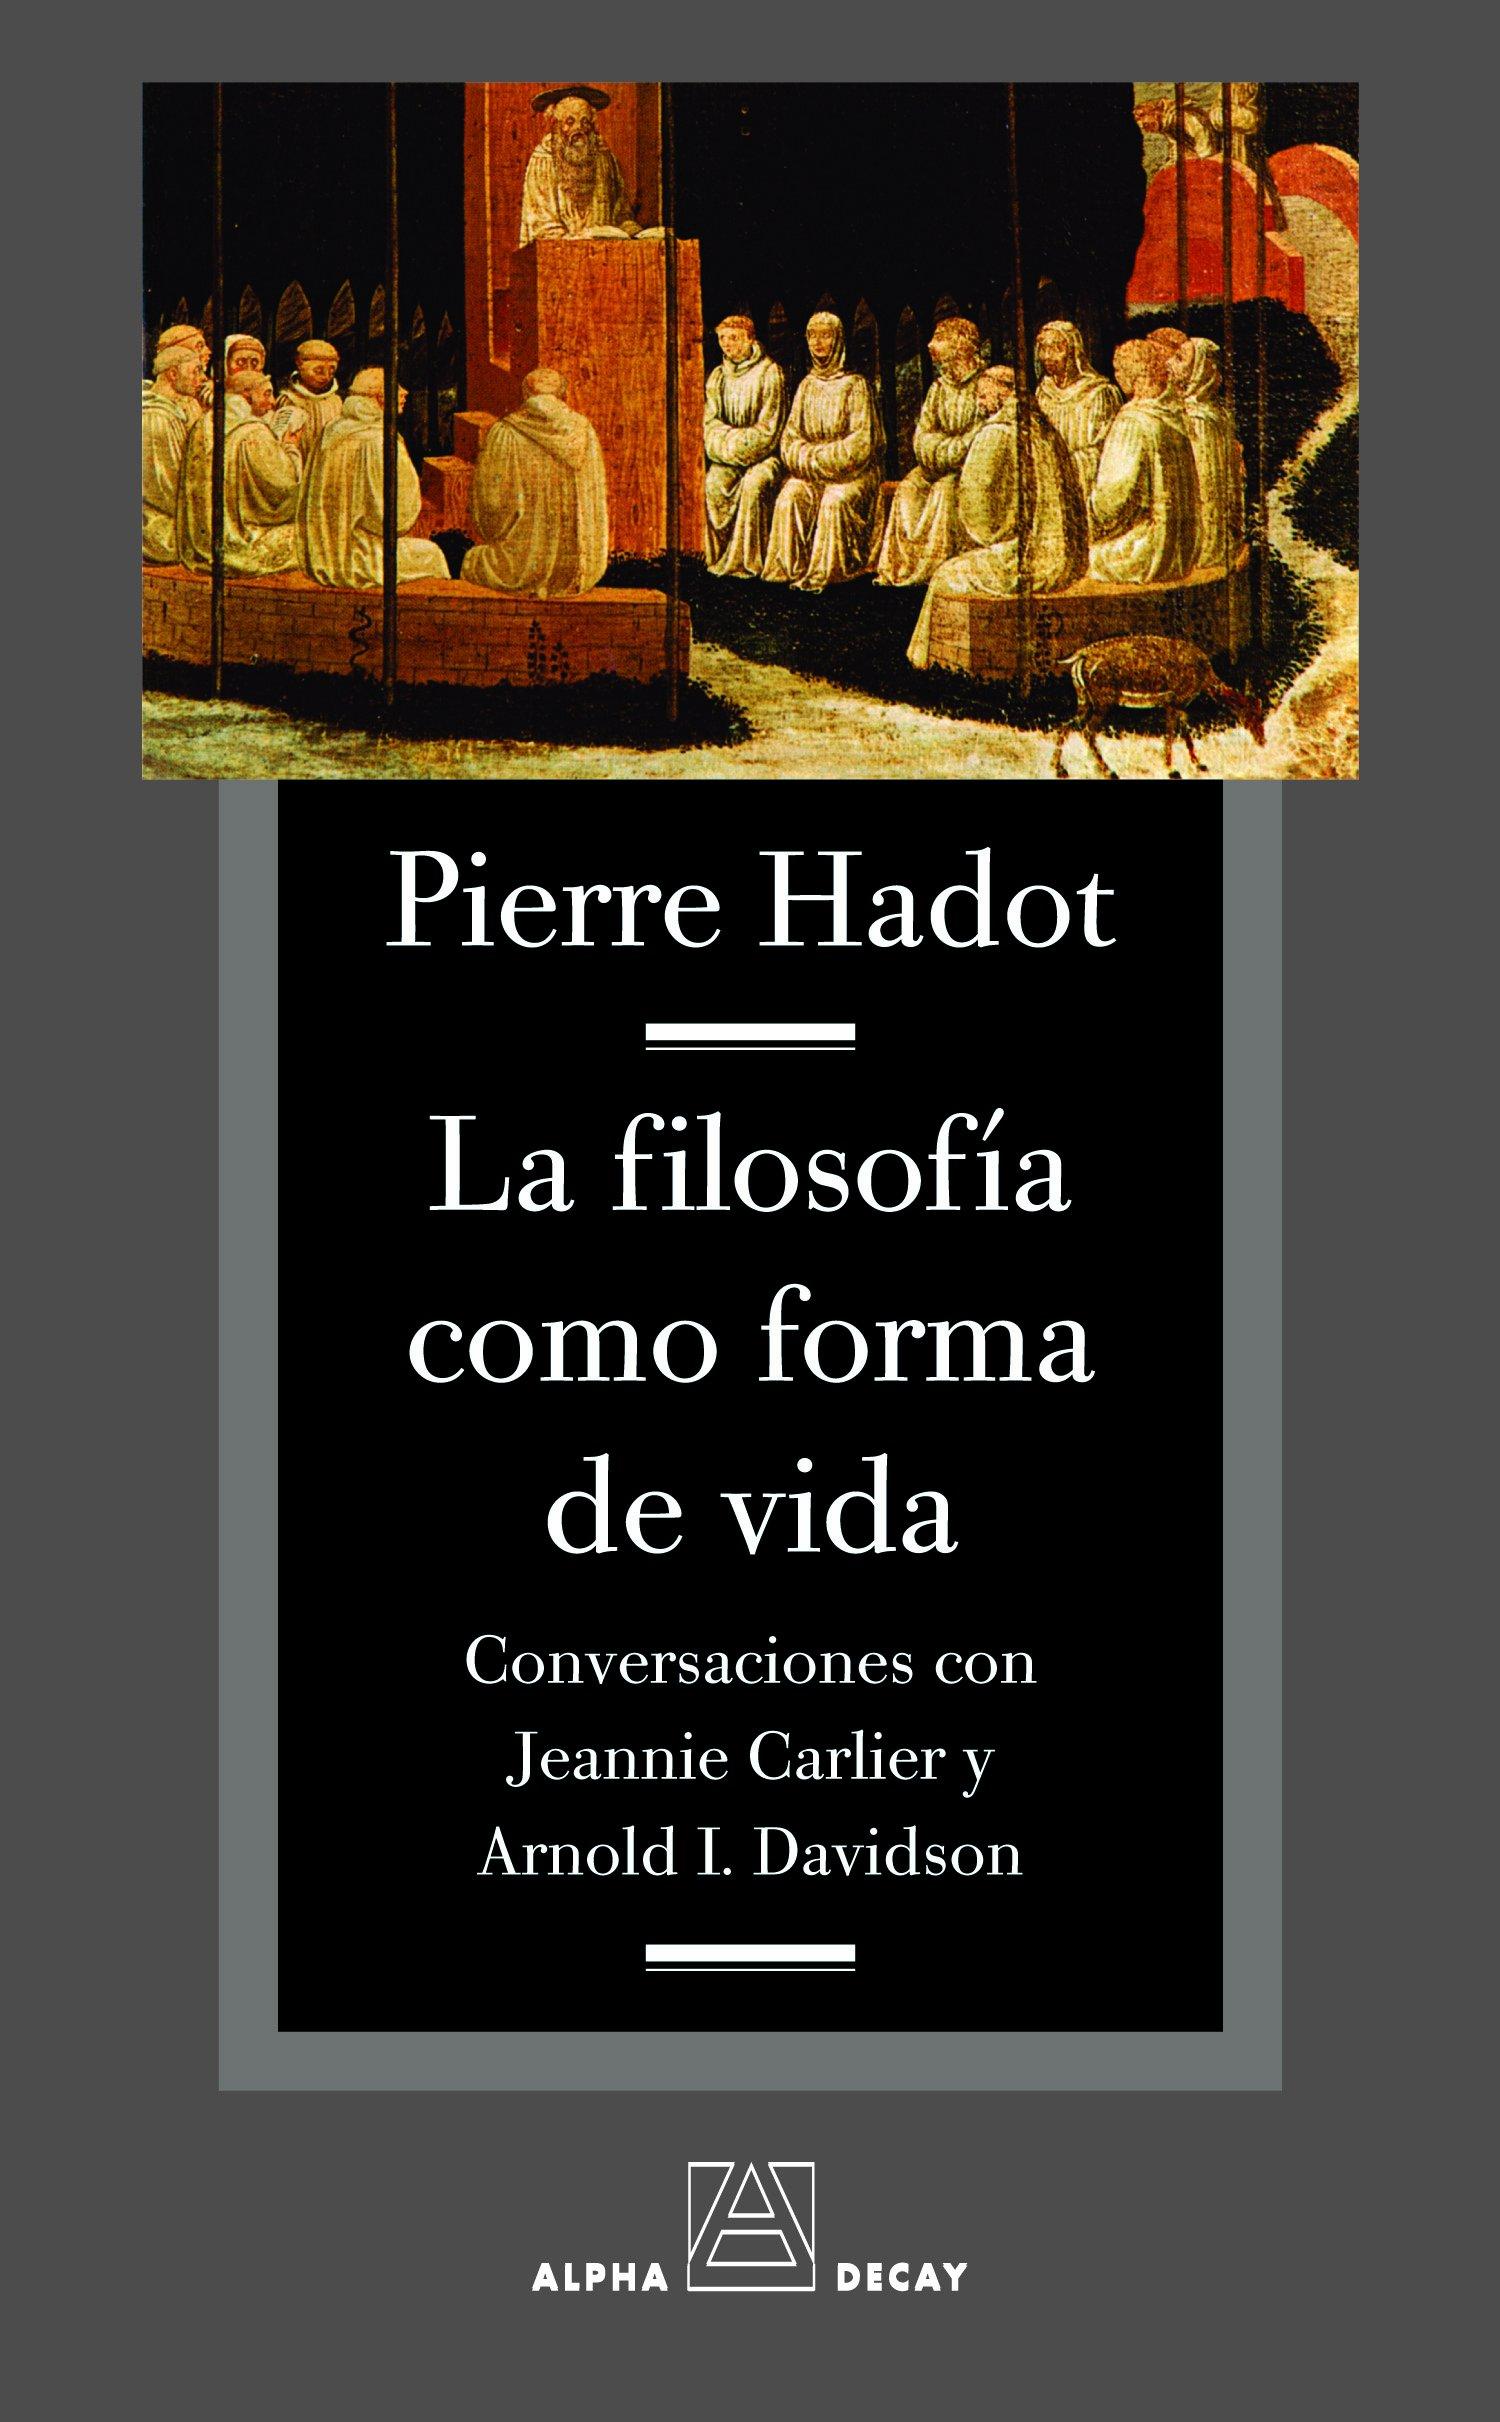 Libro Pierre Hadot